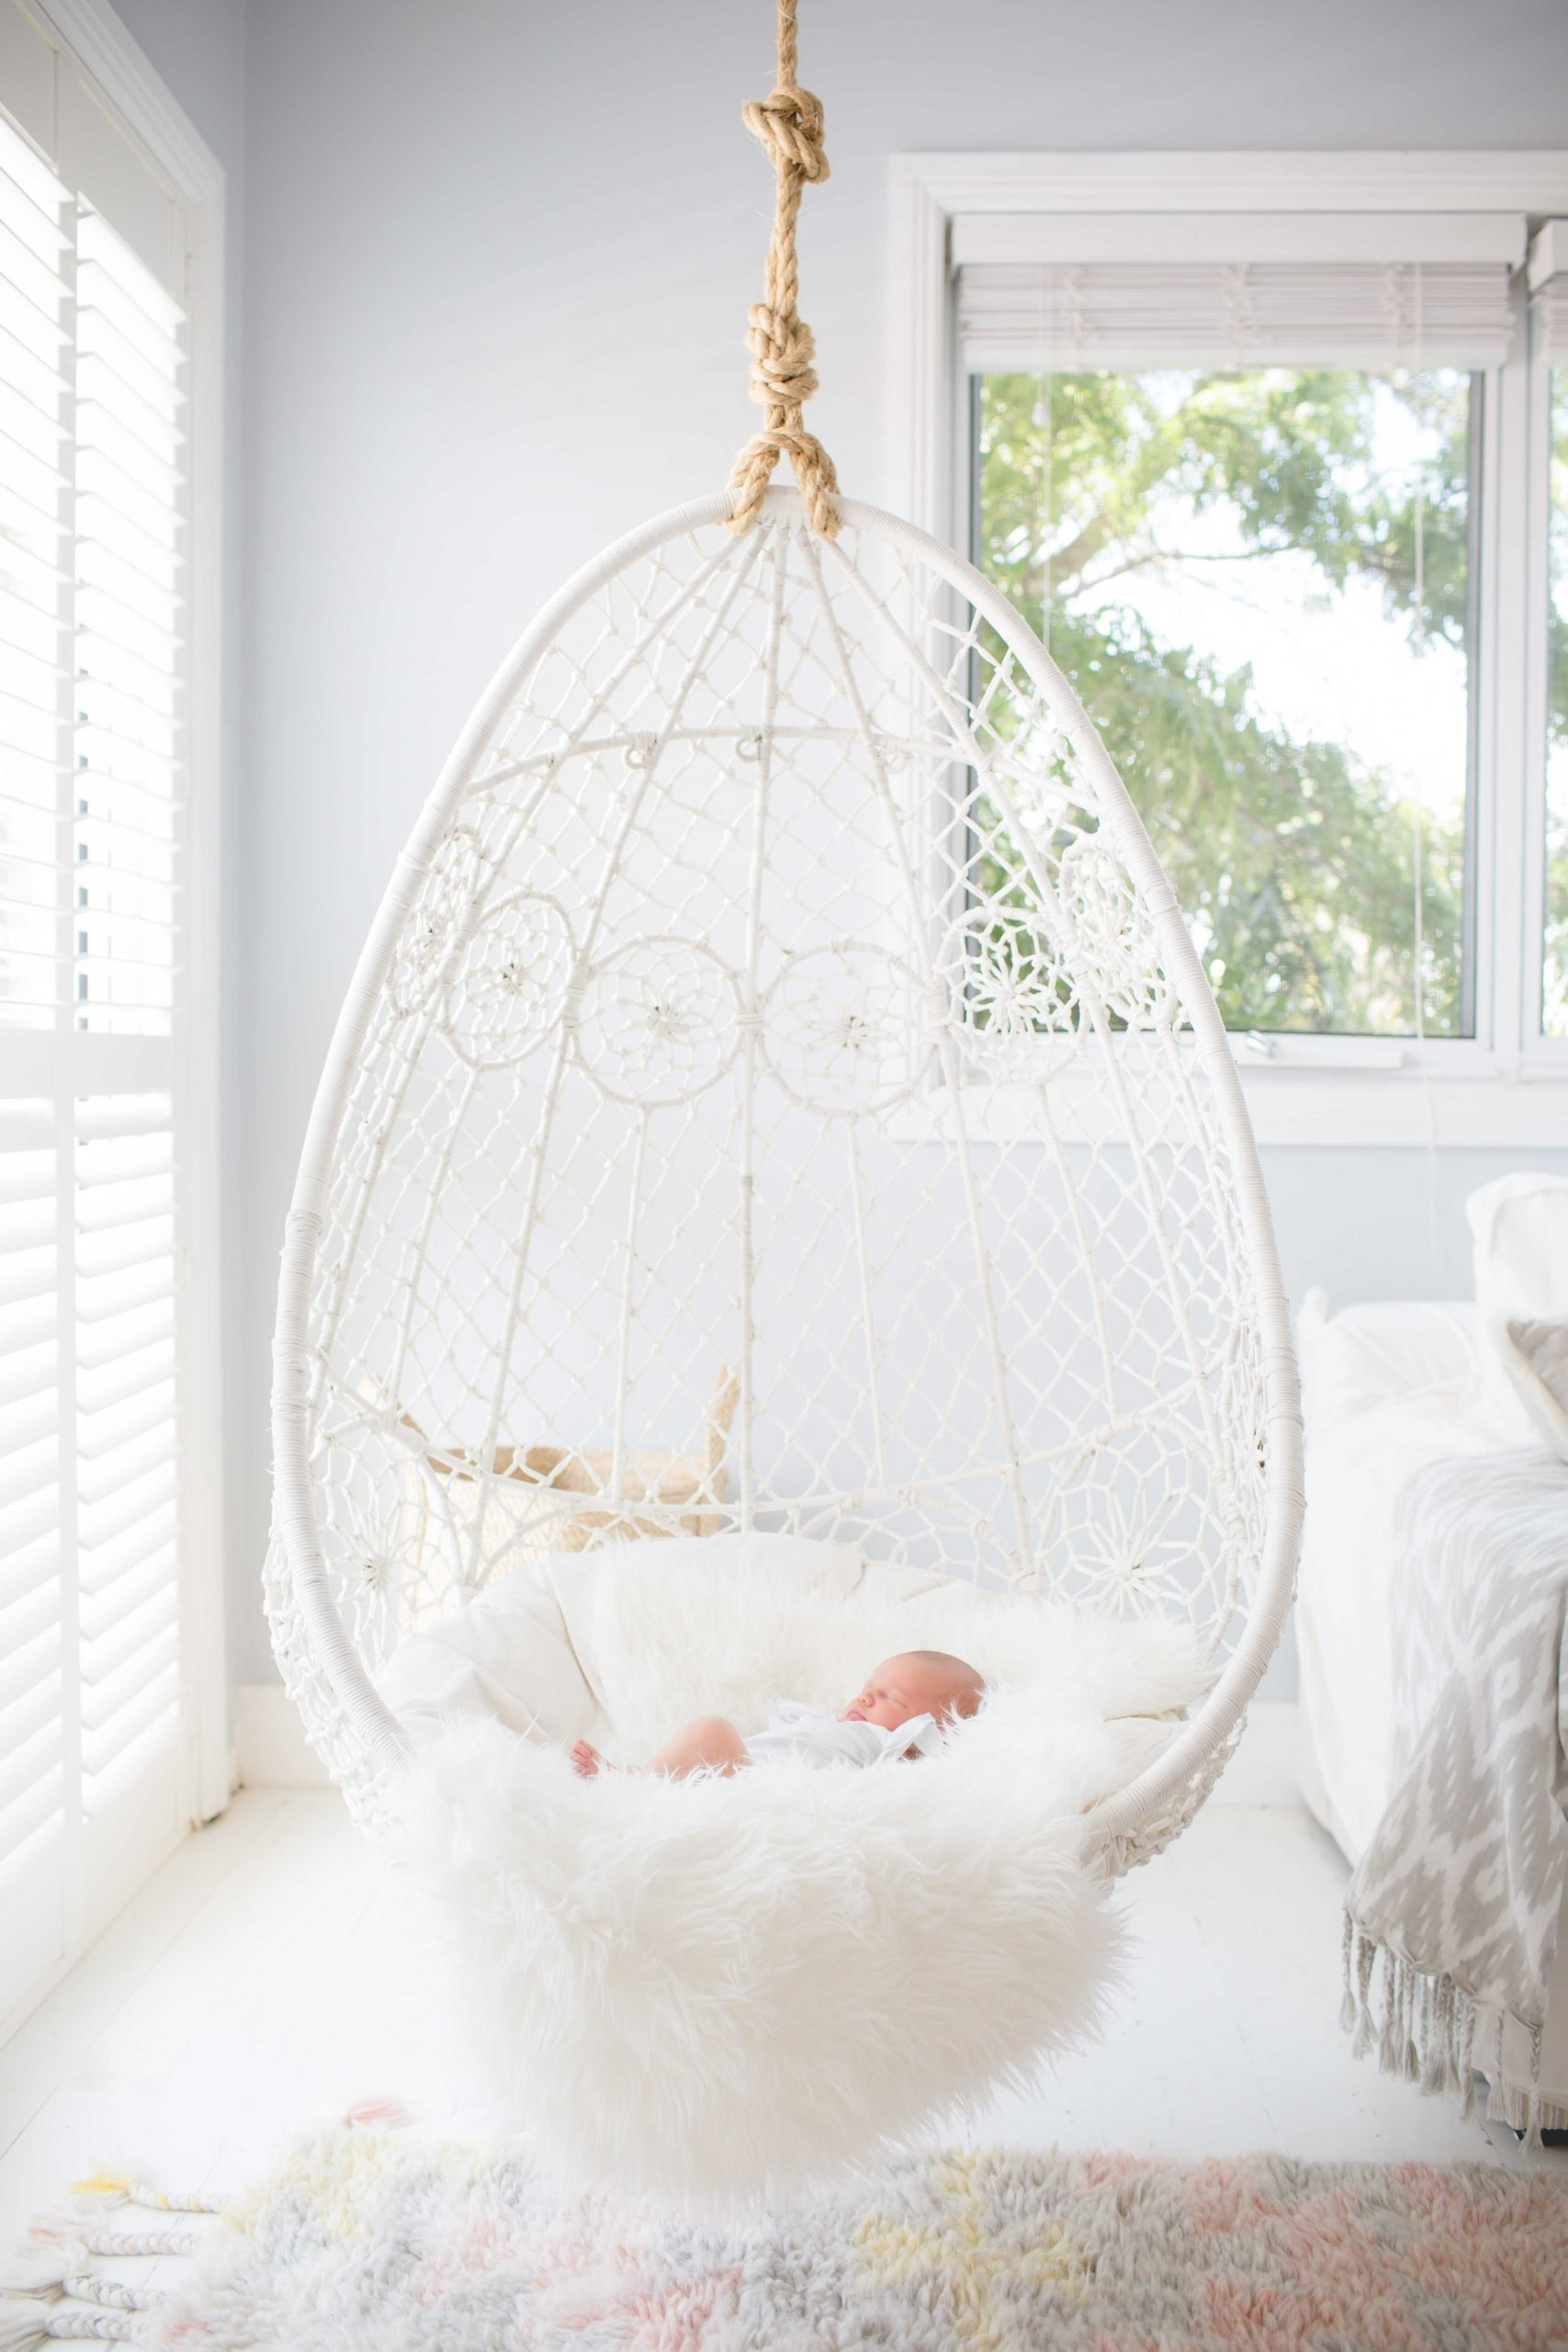 Full Size of Schlafzimmer Stuhl Genial Hanging Egg Fr Sthle Gardinen Schimmel Im Wandbilder Klimagerät Für Liegestuhl Garten Lampen Sessel Schaukelstuhl Lampe Kommode Schlafzimmer Schlafzimmer Stuhl